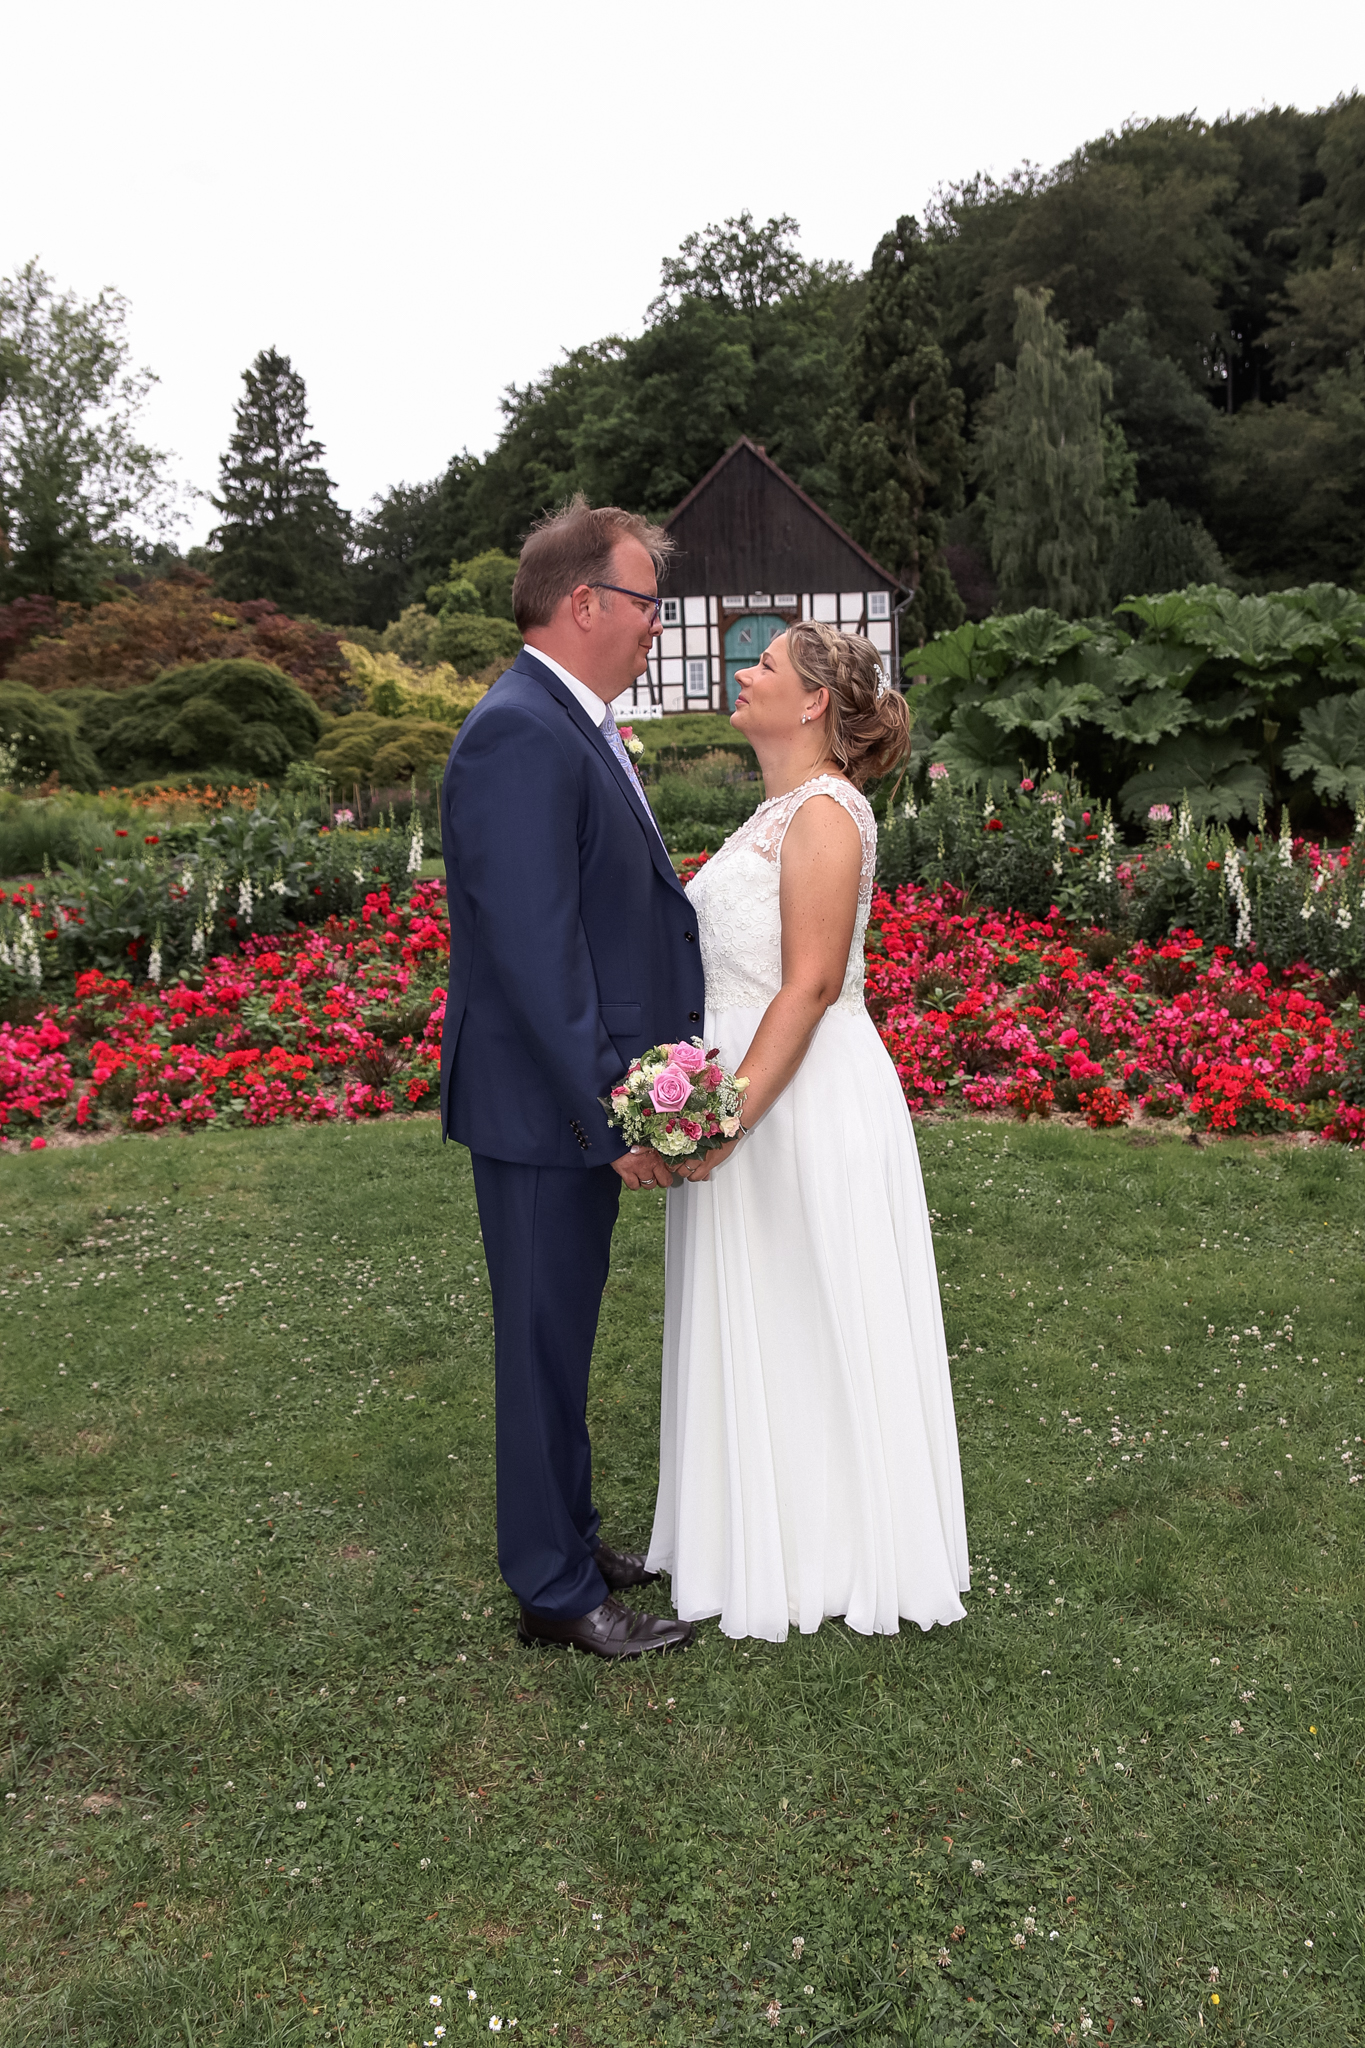 Wedding Shooting Outdoor